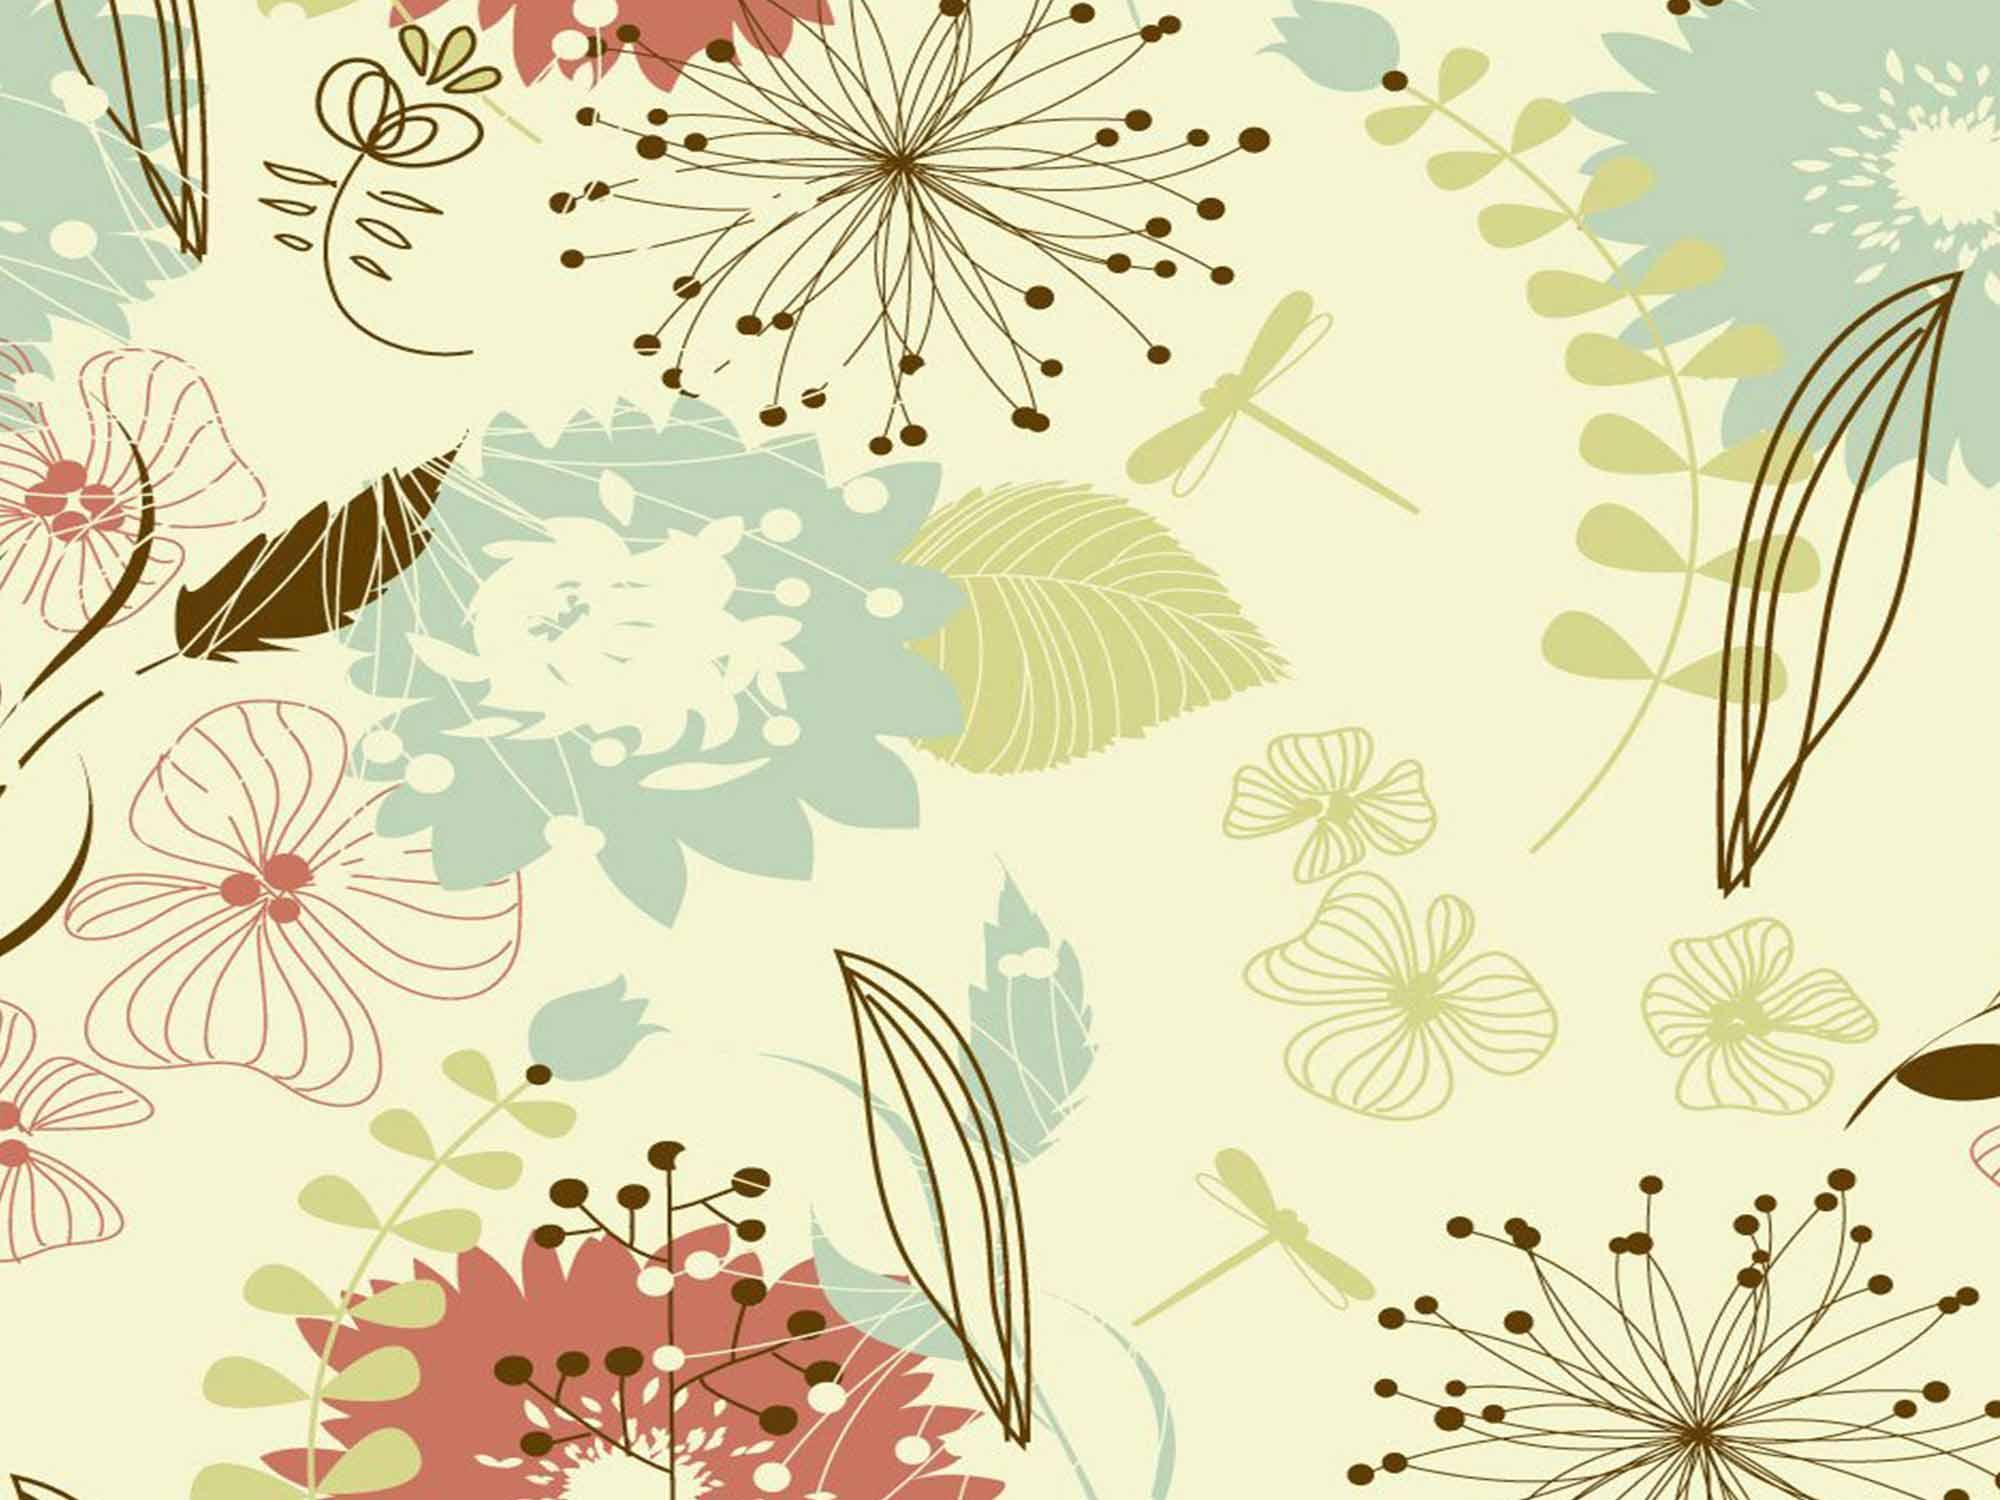 Papel de Parede Floral 0036 - Adesivos de Parede  - Paredes Decoradas